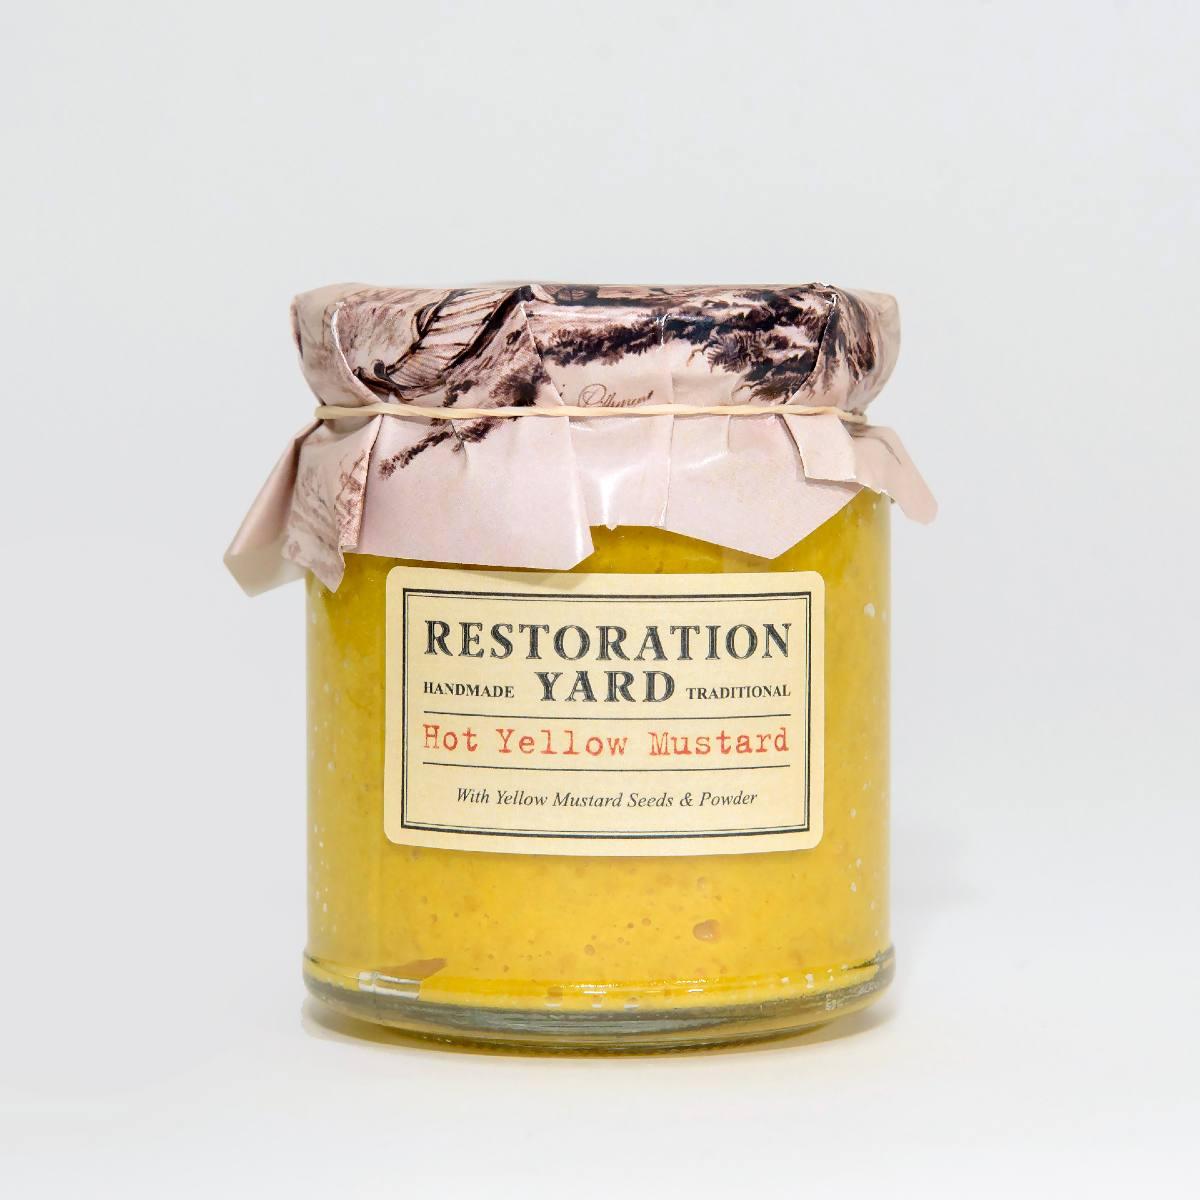 Restoration Yard Hot Yellow Mustard | Restoration Yard